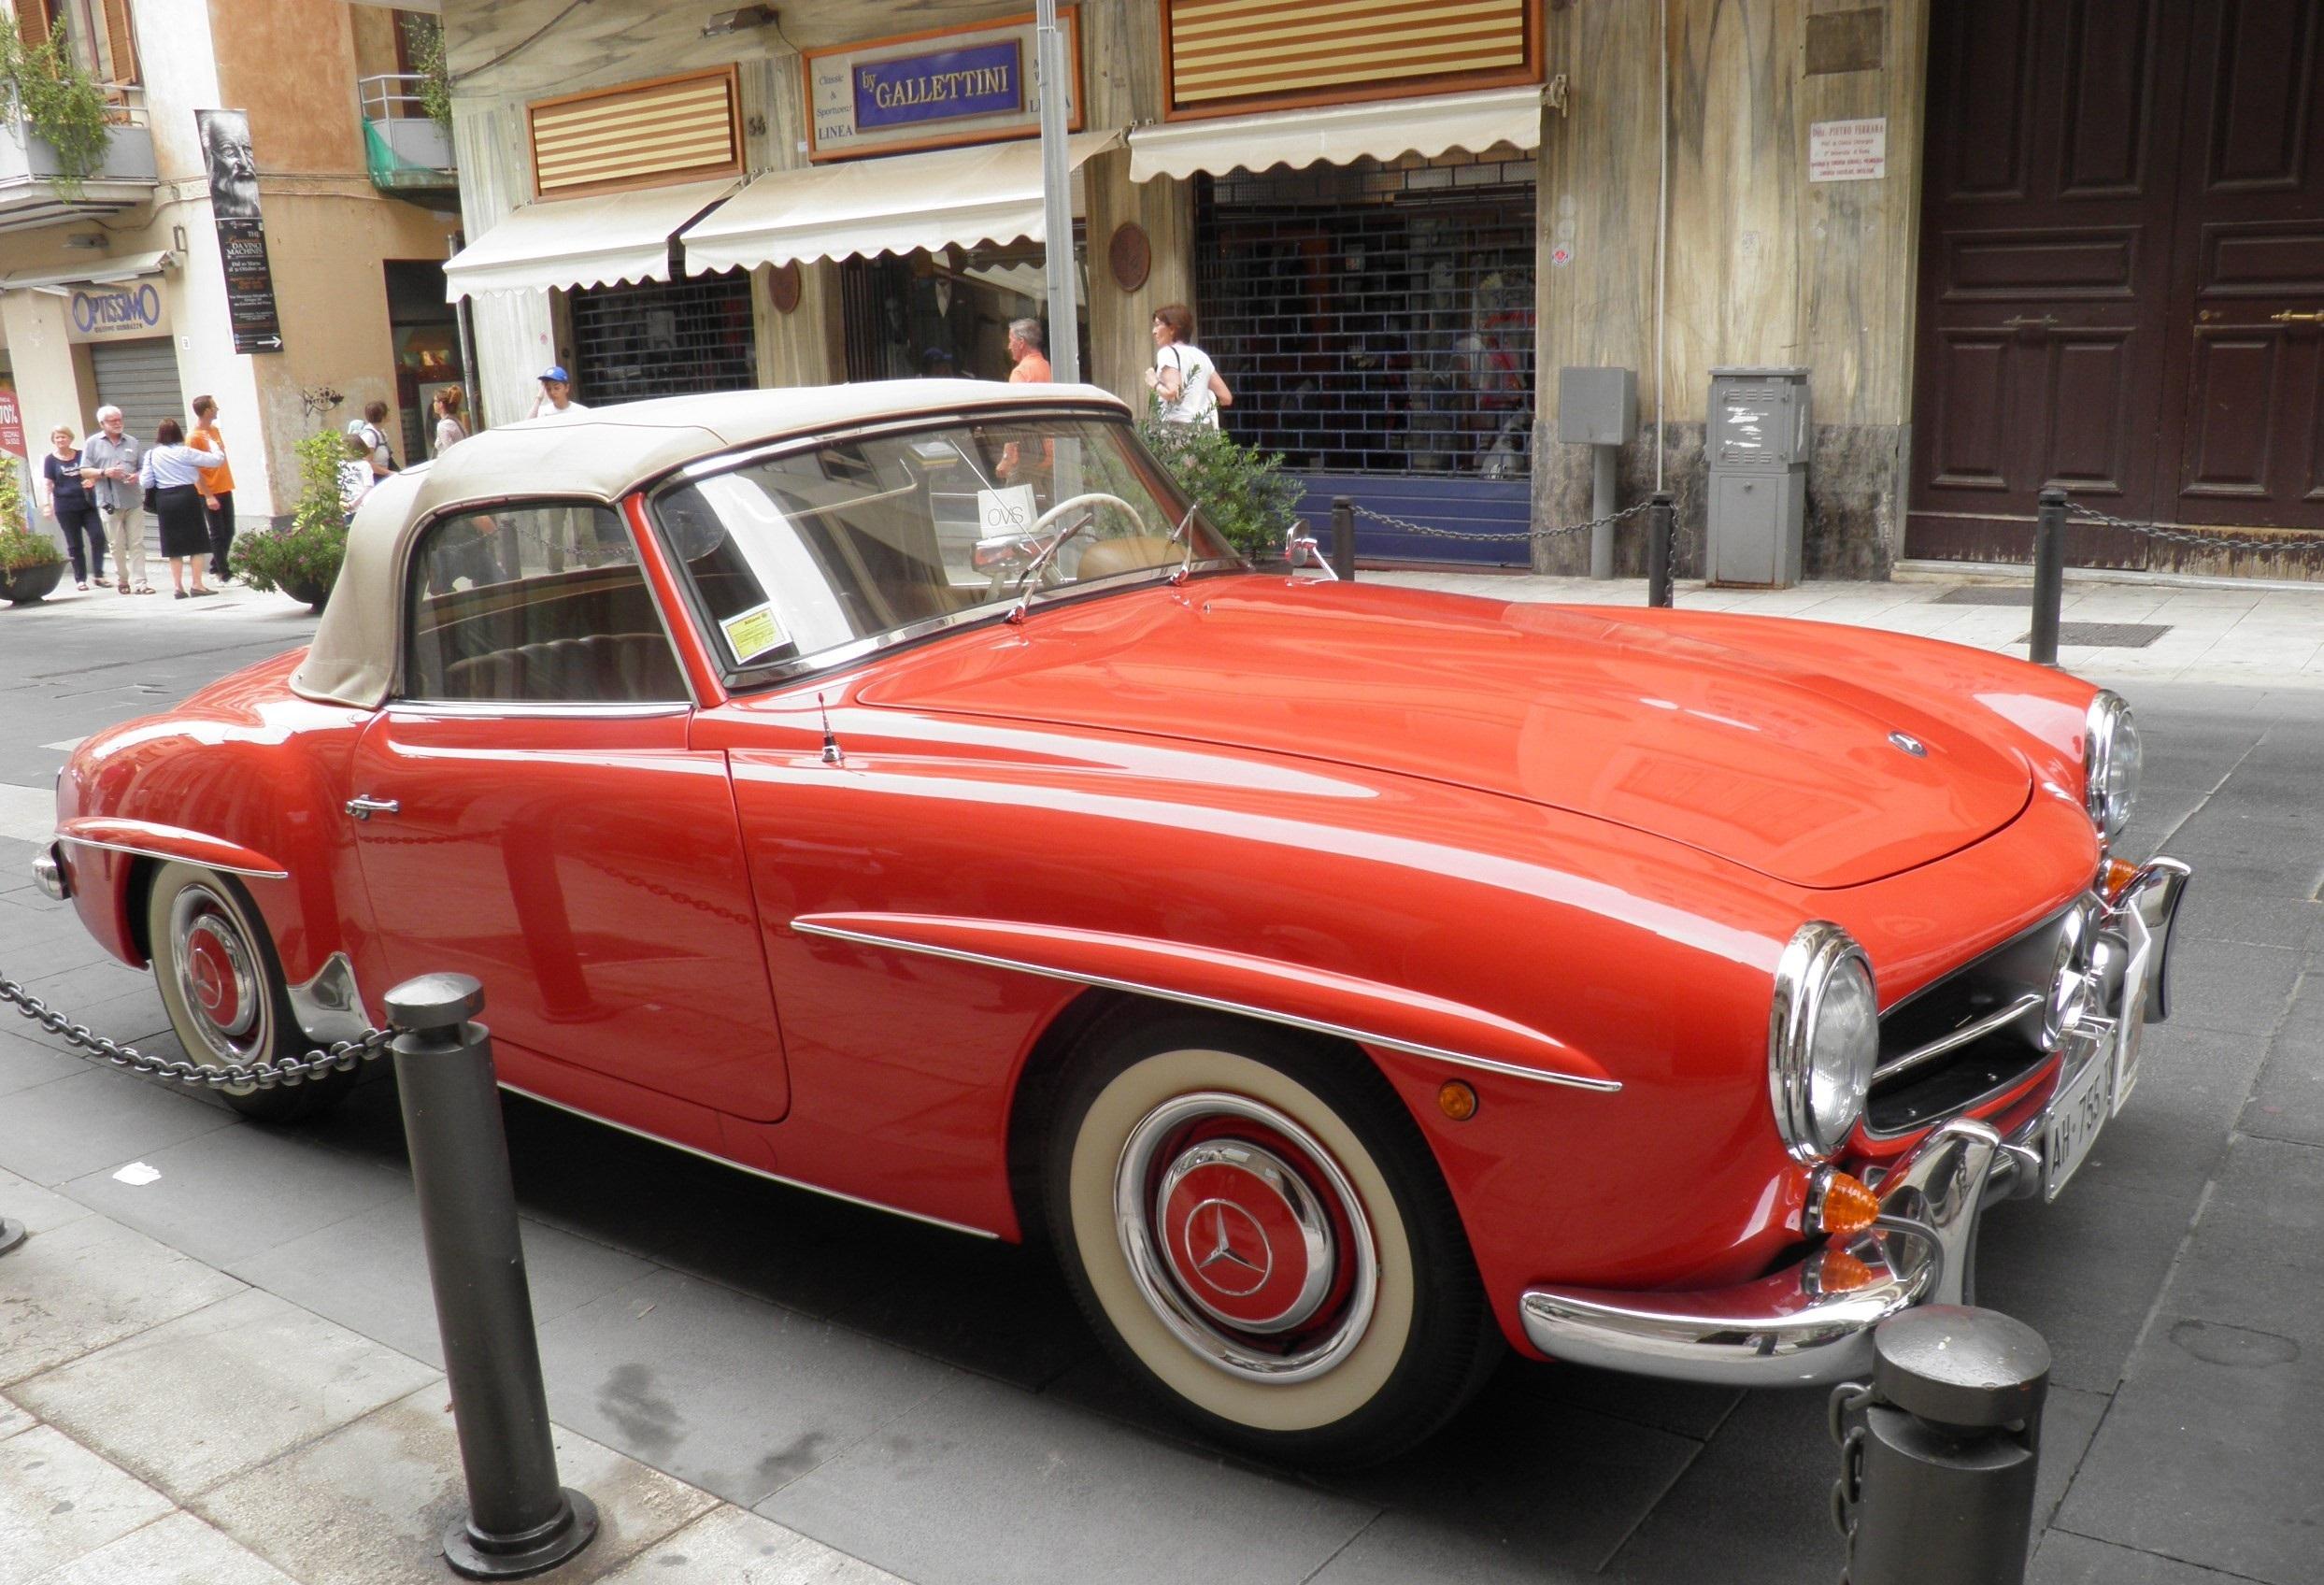 Free Images : retro, old, transportation, red, nostalgia, classic ...